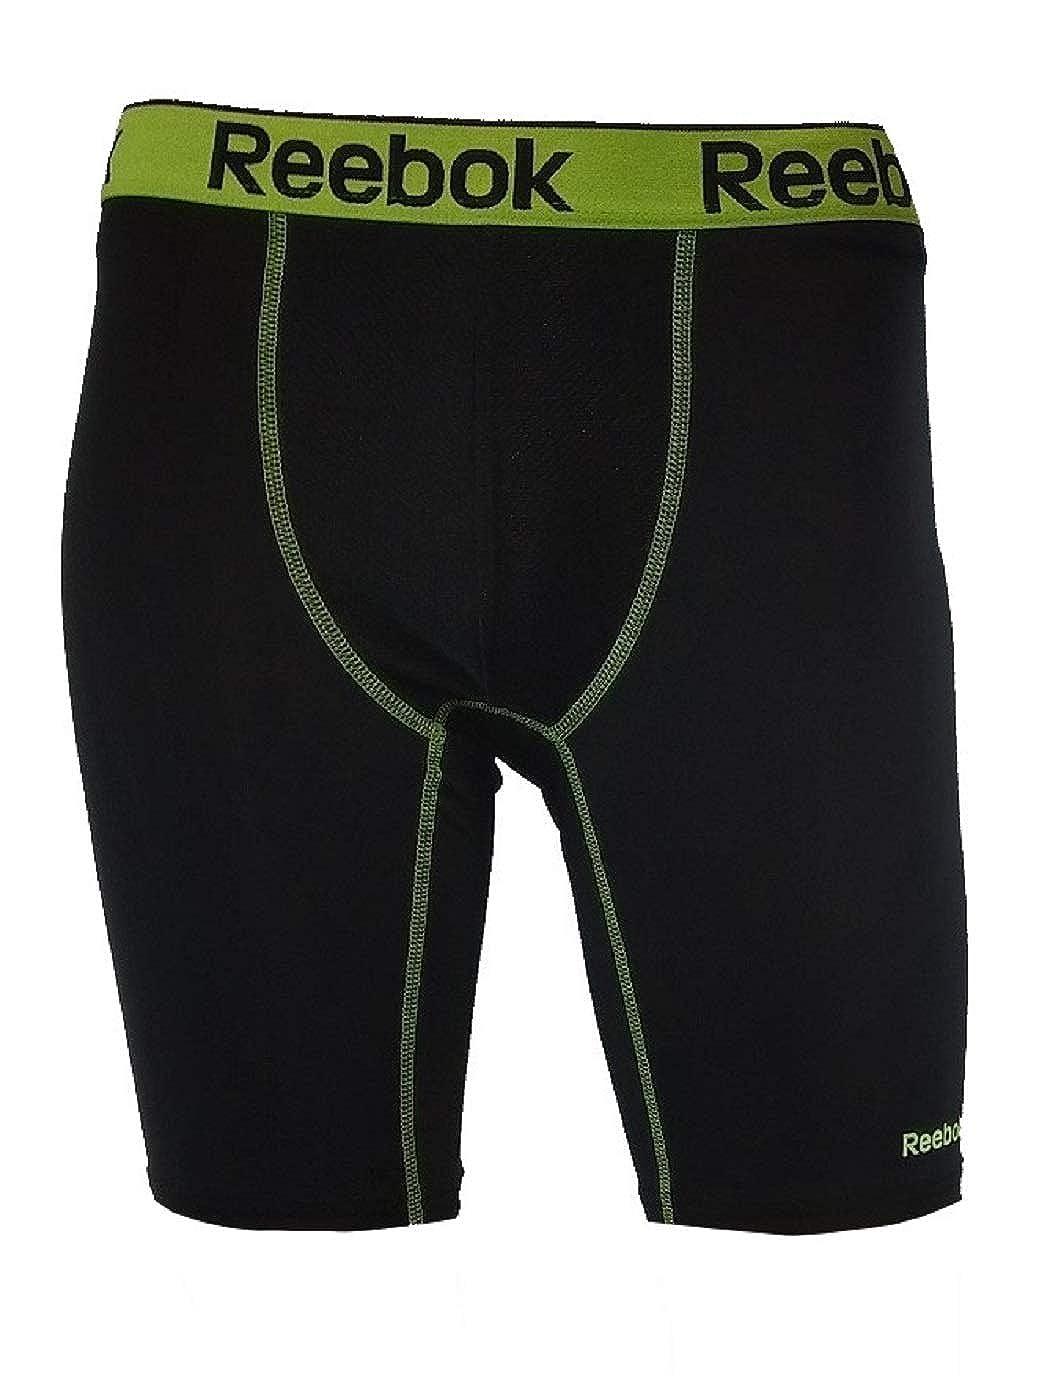 2d4e0bd136159 Reebok Men's Performance Boxer Brief Brief at Amazon Men's Clothing store: